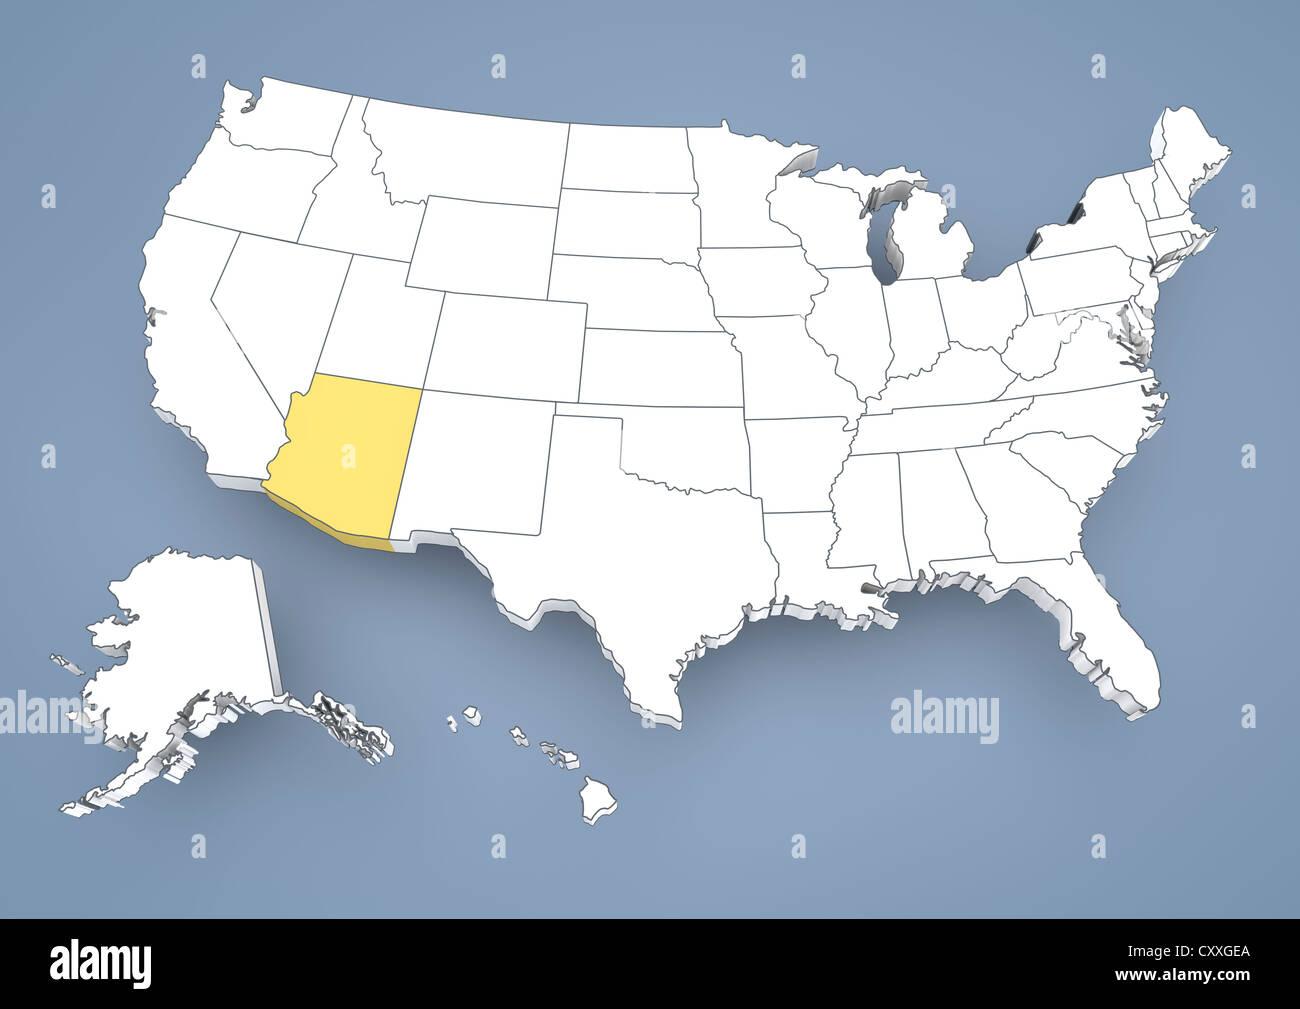 Arizona, AZ, highlighted on a contour map of USA, United States of ...